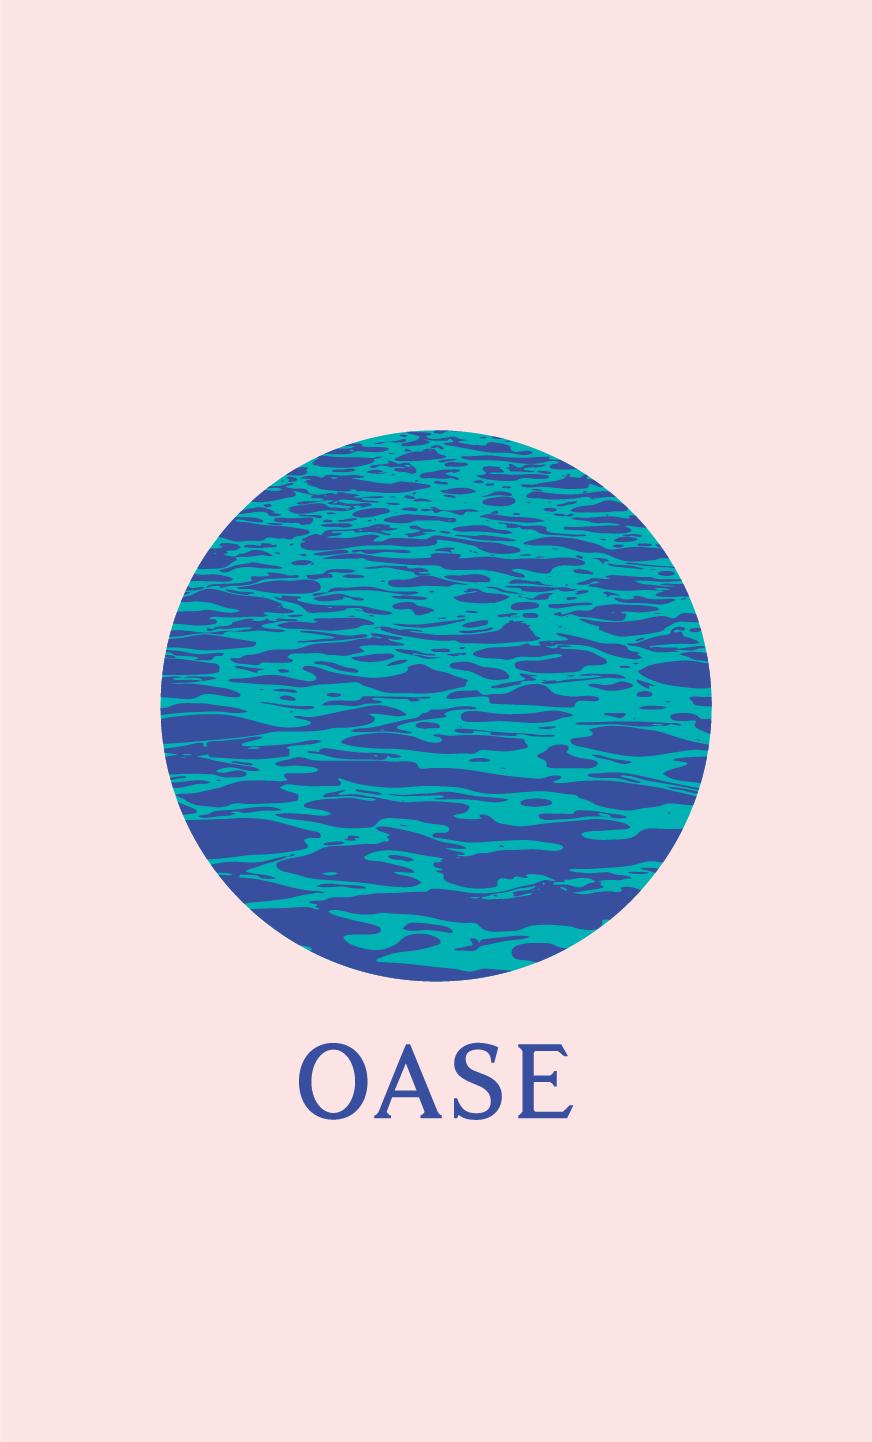 Oase Design Logo Identity Huisstijl Detlet